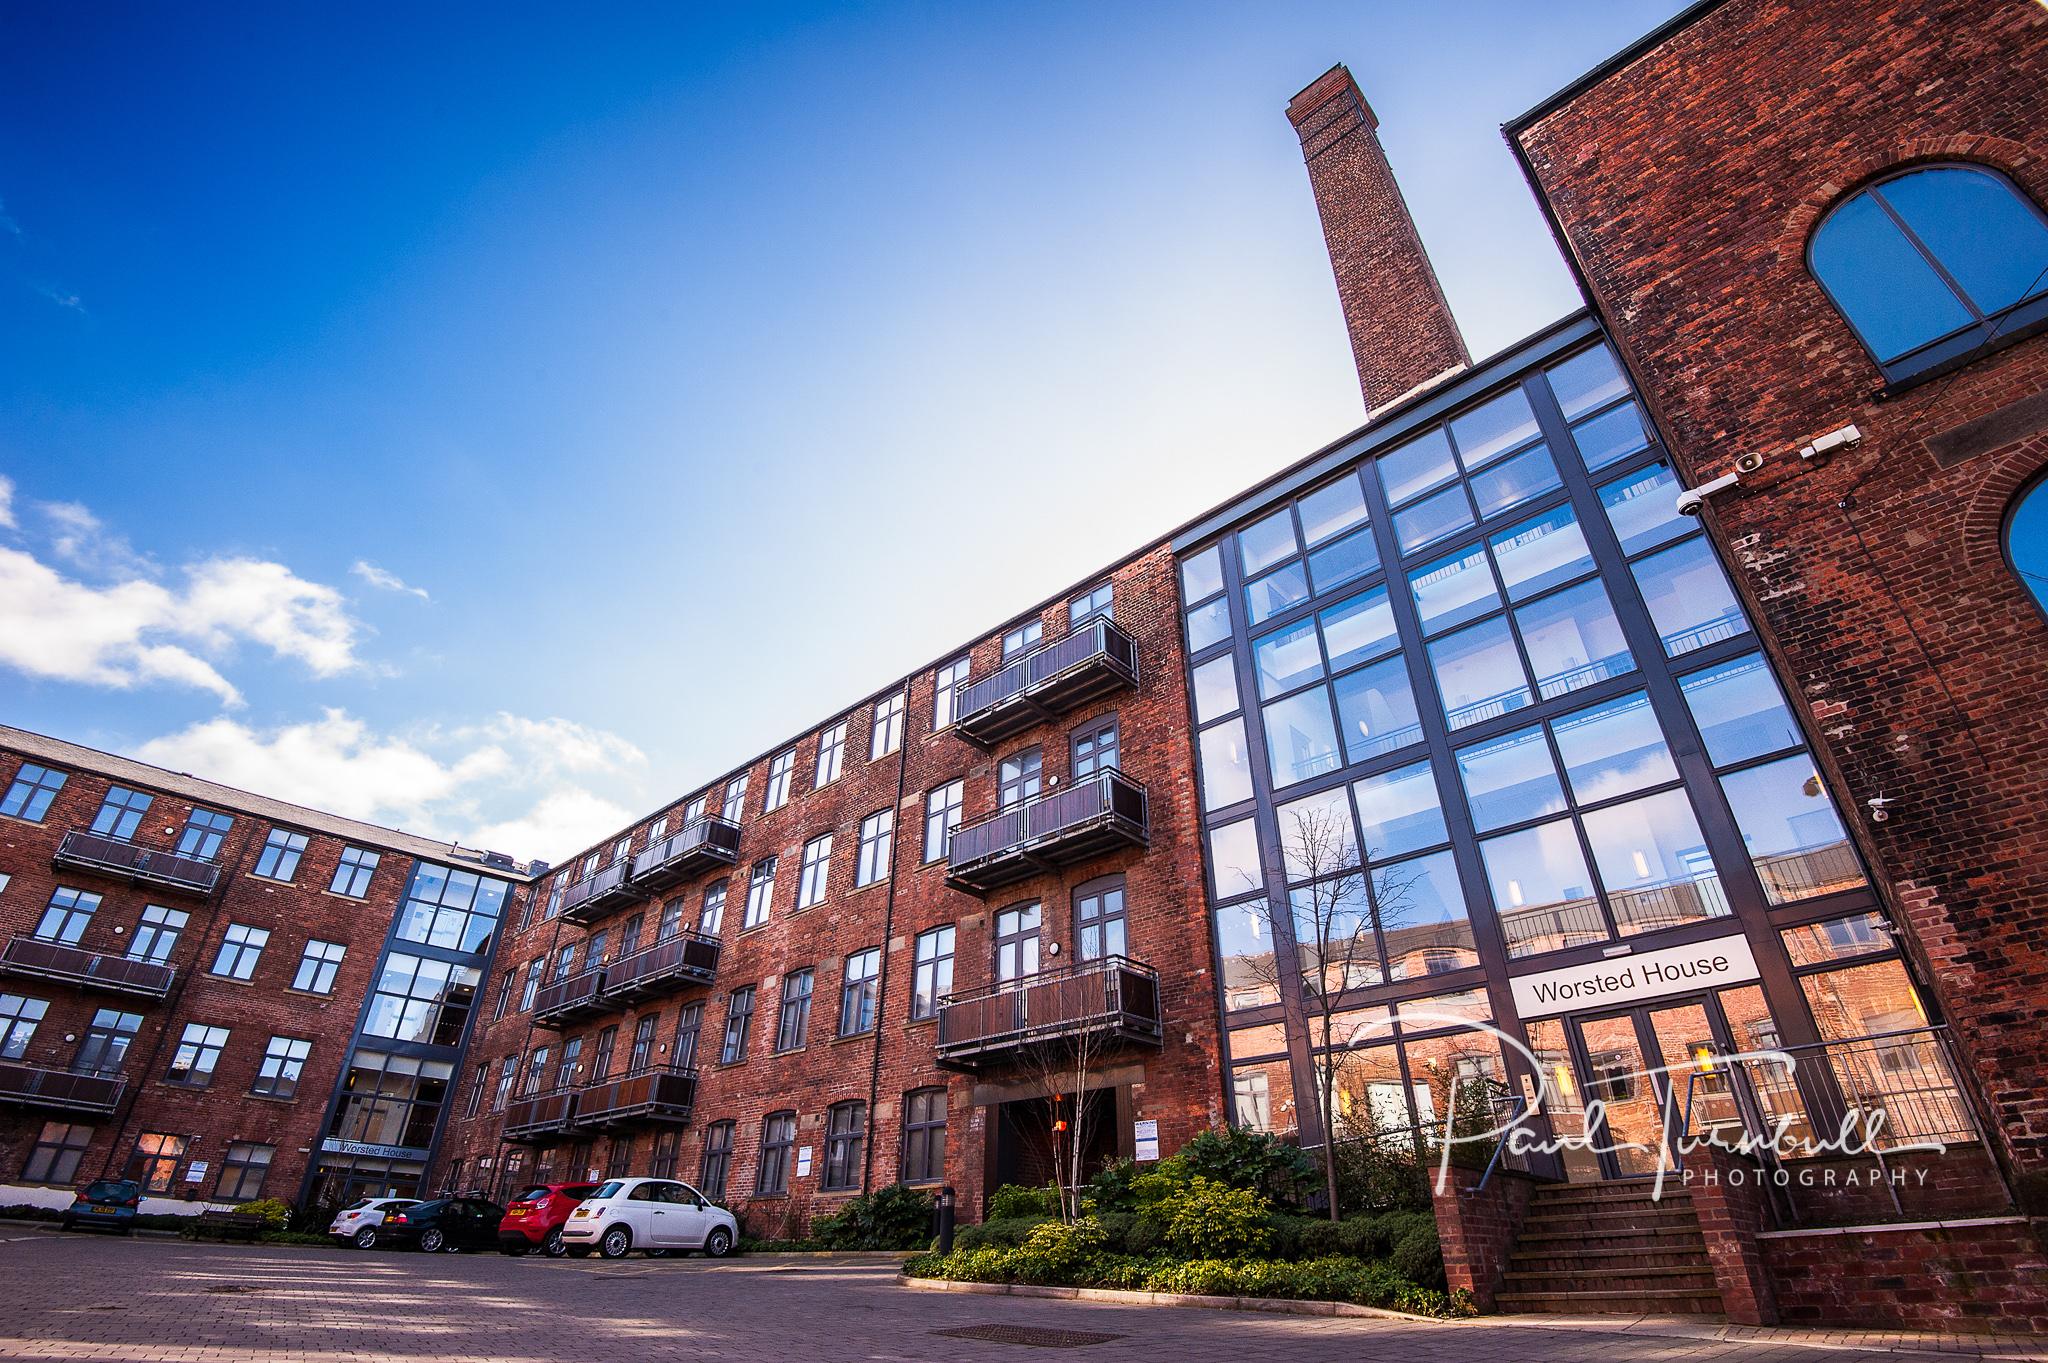 commercial-property-photographer-leeds-yorkshire-blackbrook-developments-005.jpg